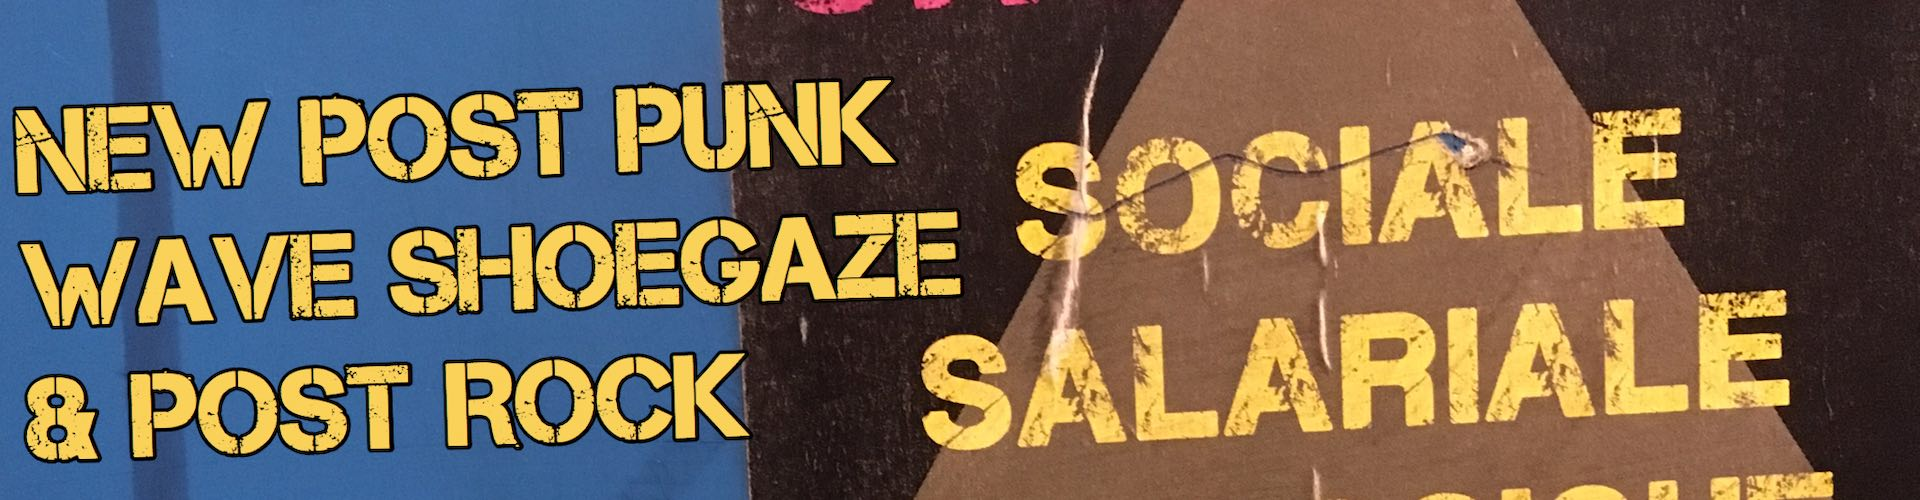 Post-Punk-Paris-copy-2